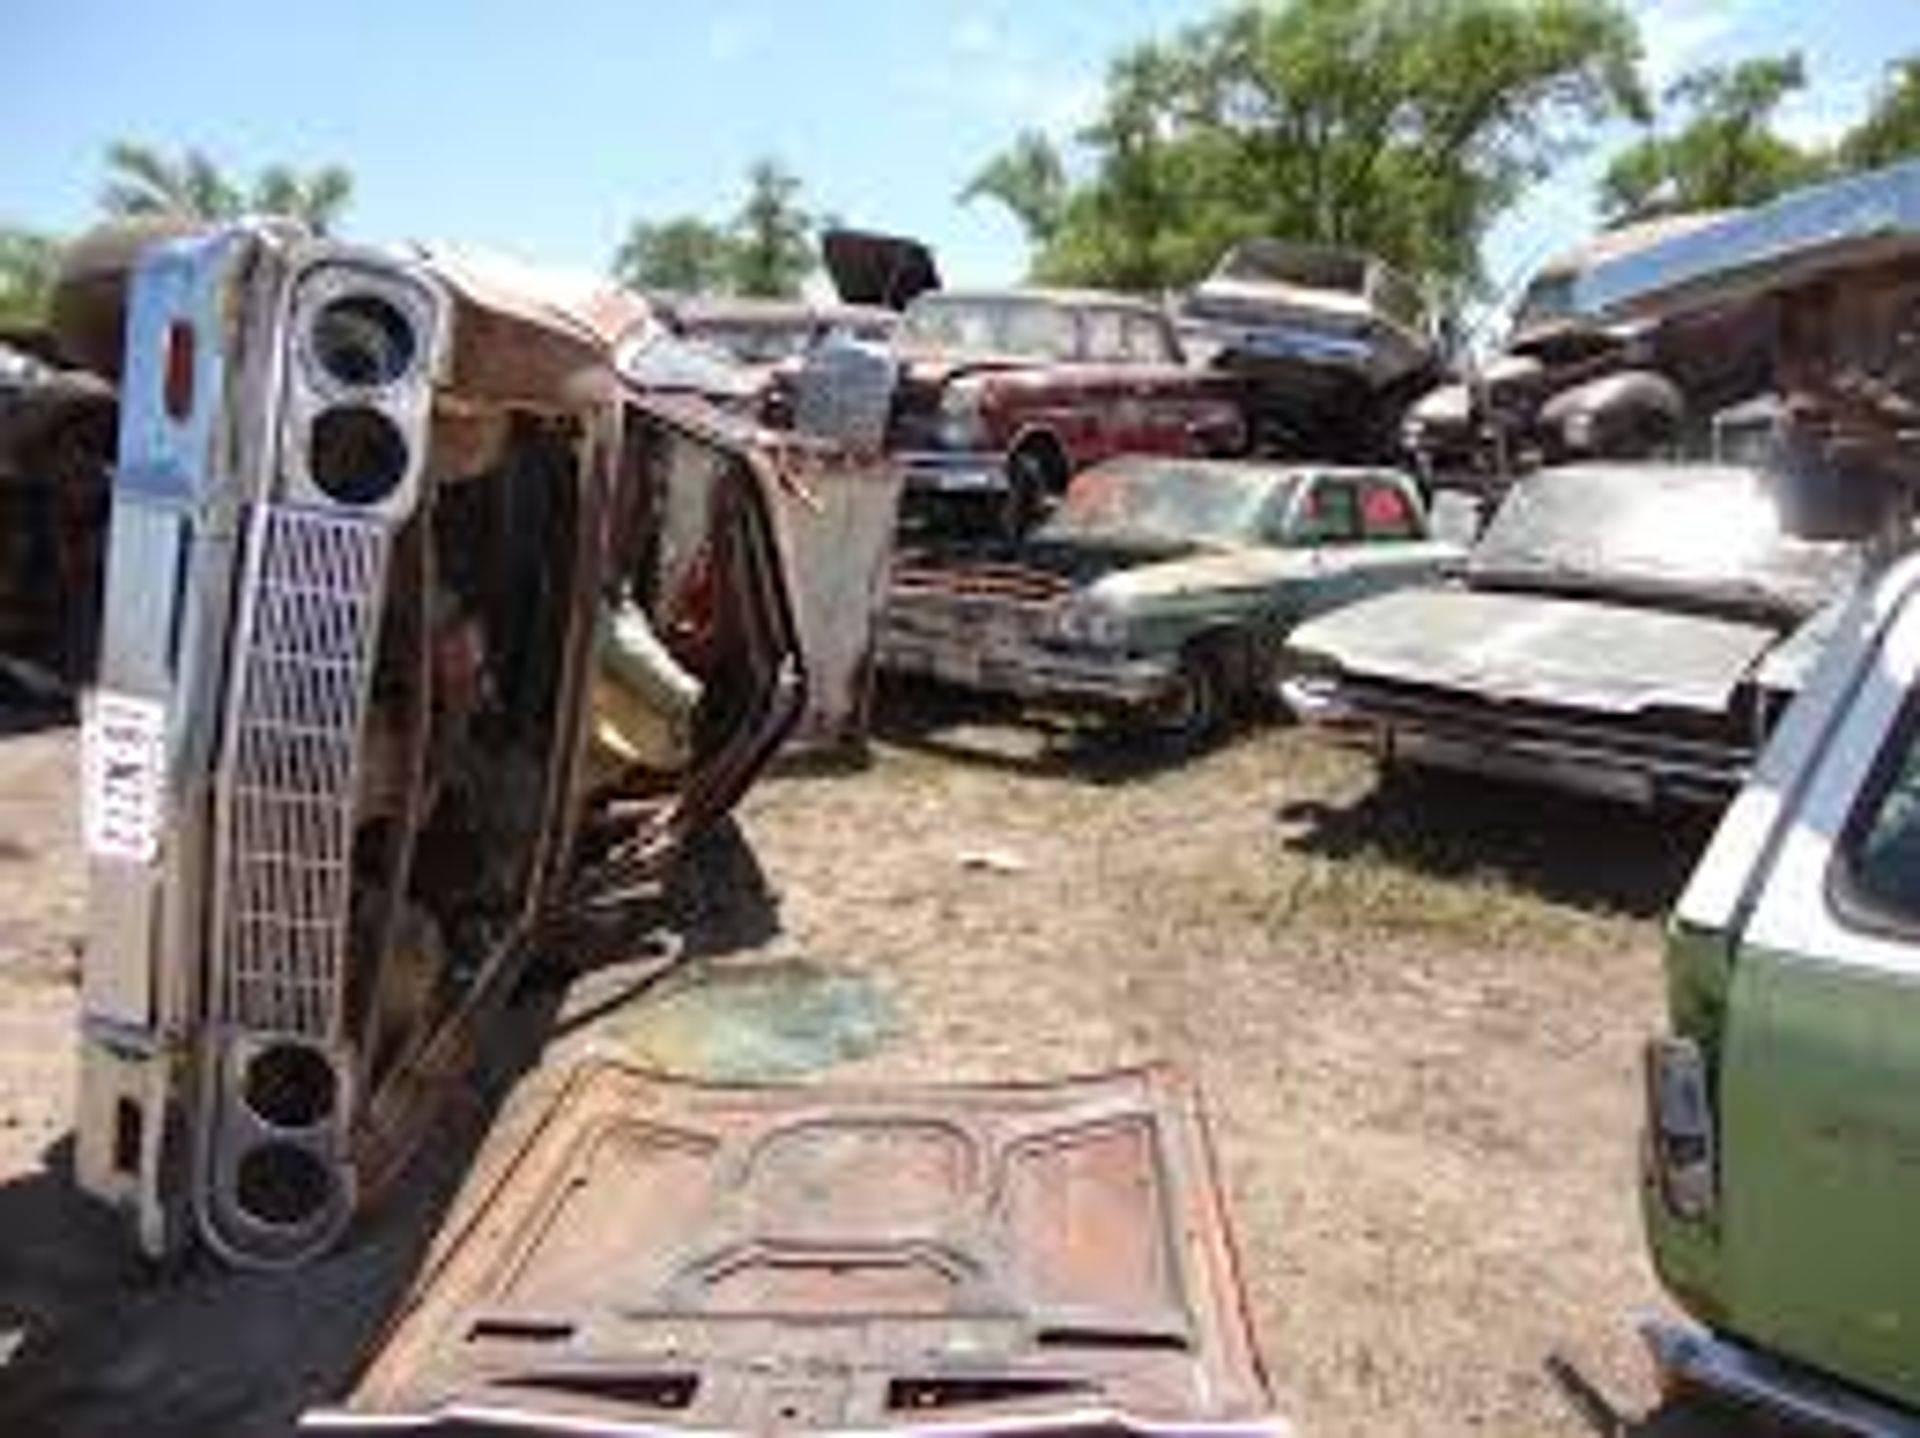 salvage autos,scrap vehicles,junk car buyers,scrap car buyers, junk car removal, scrap car removal,junk for cash